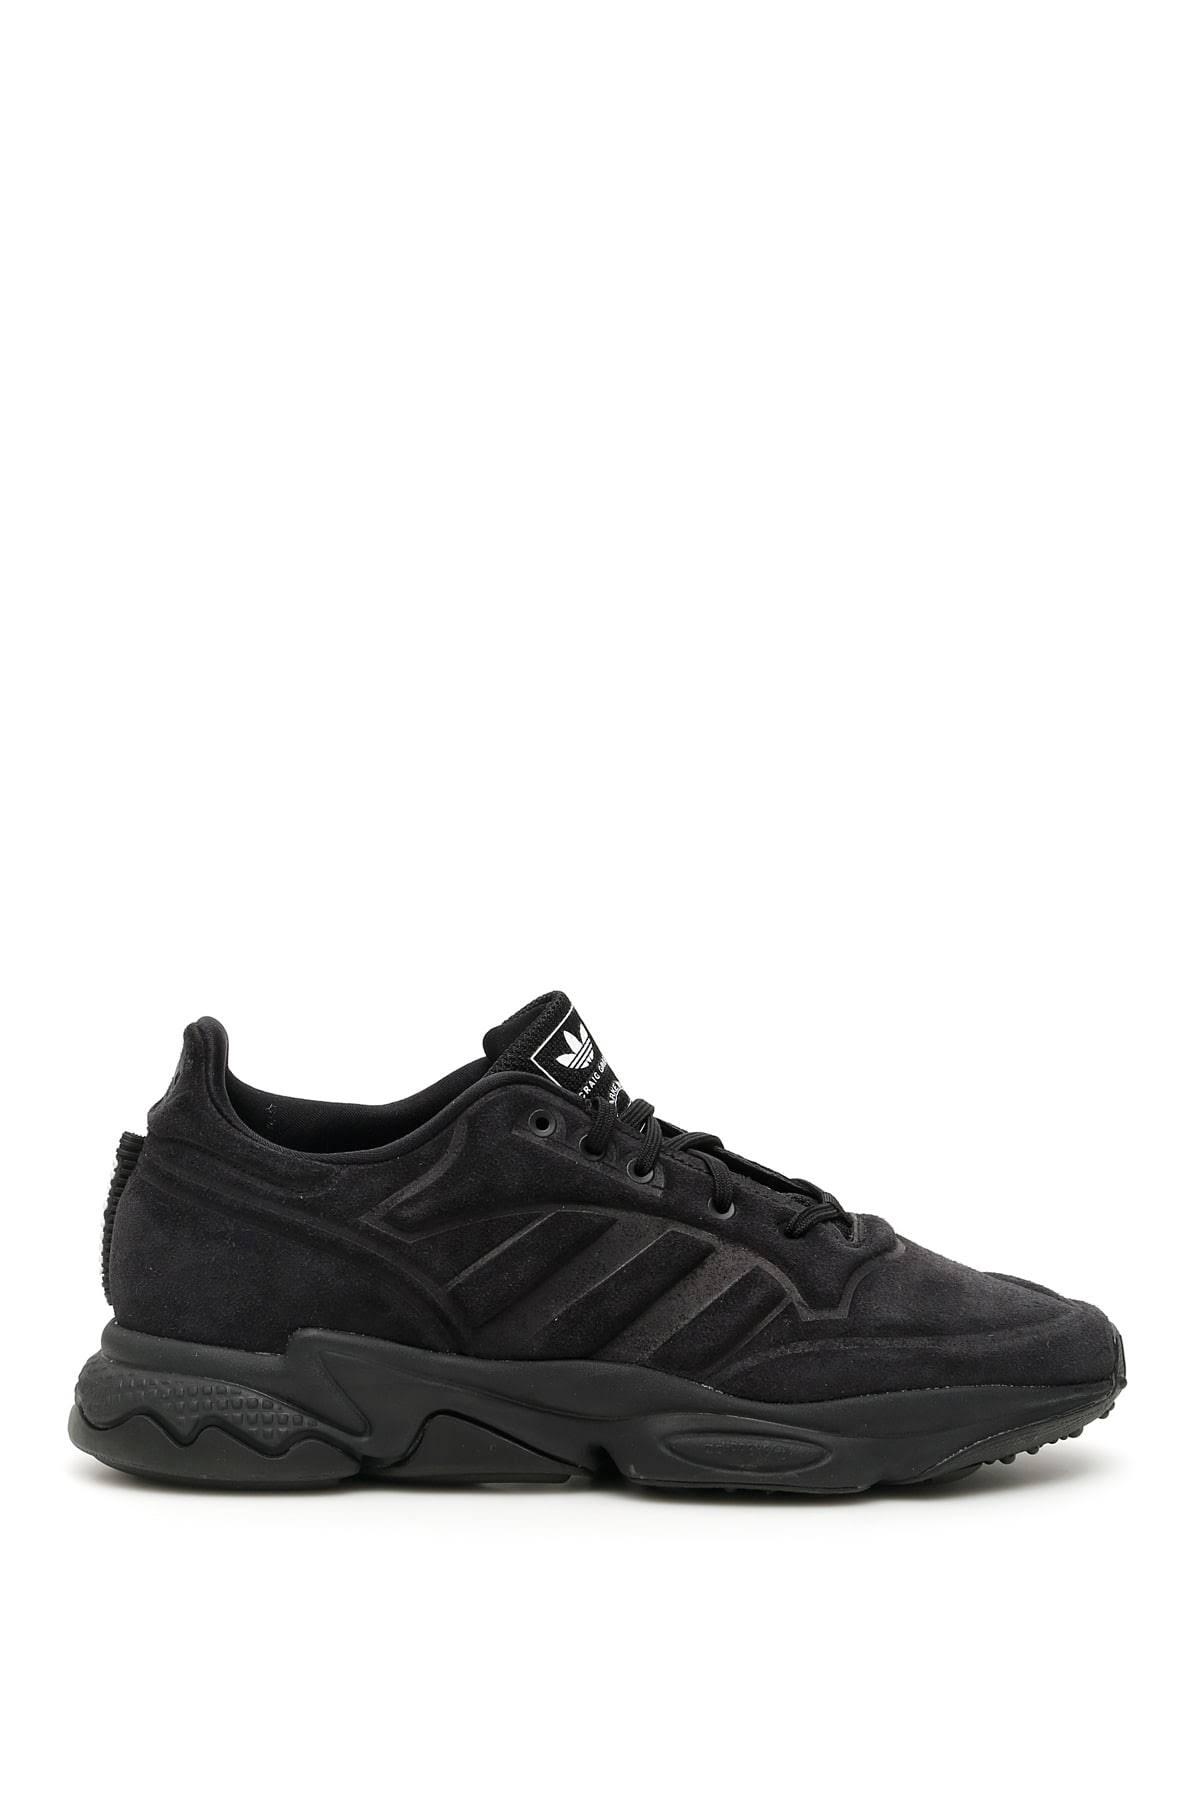 Adidas Craig Green Kontuur II Shoes - Black